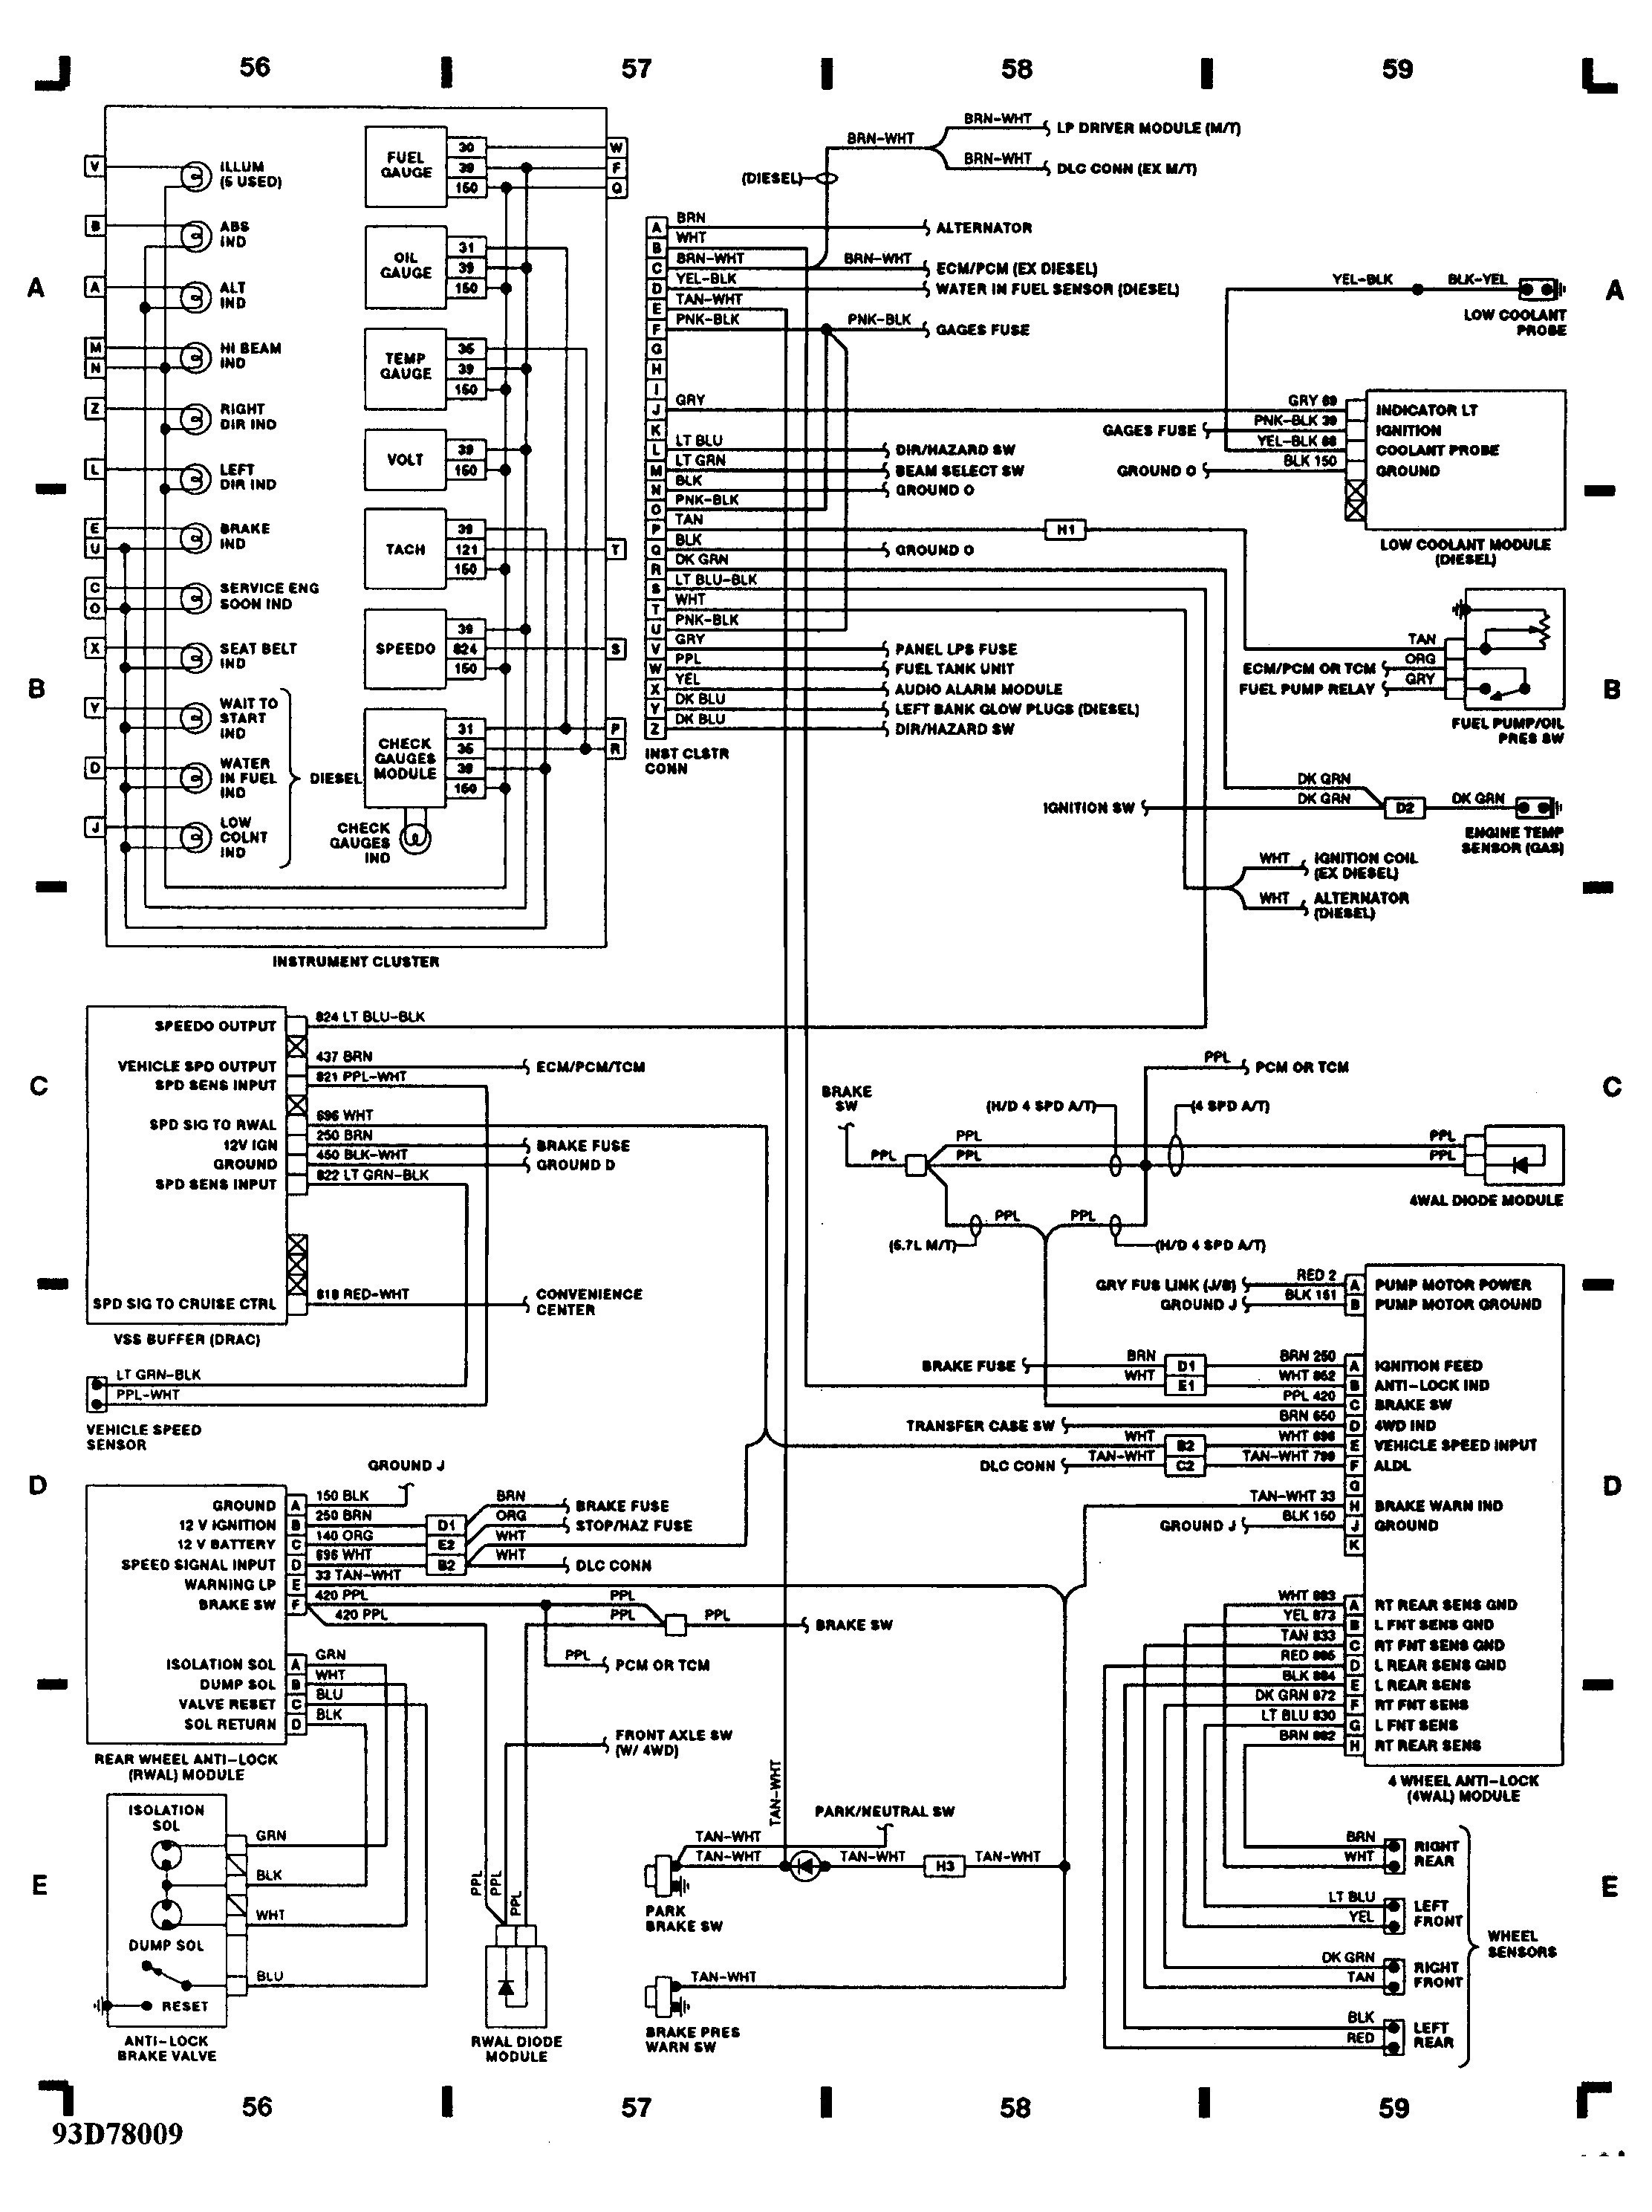 Wiring Diagram 1999 Malibu